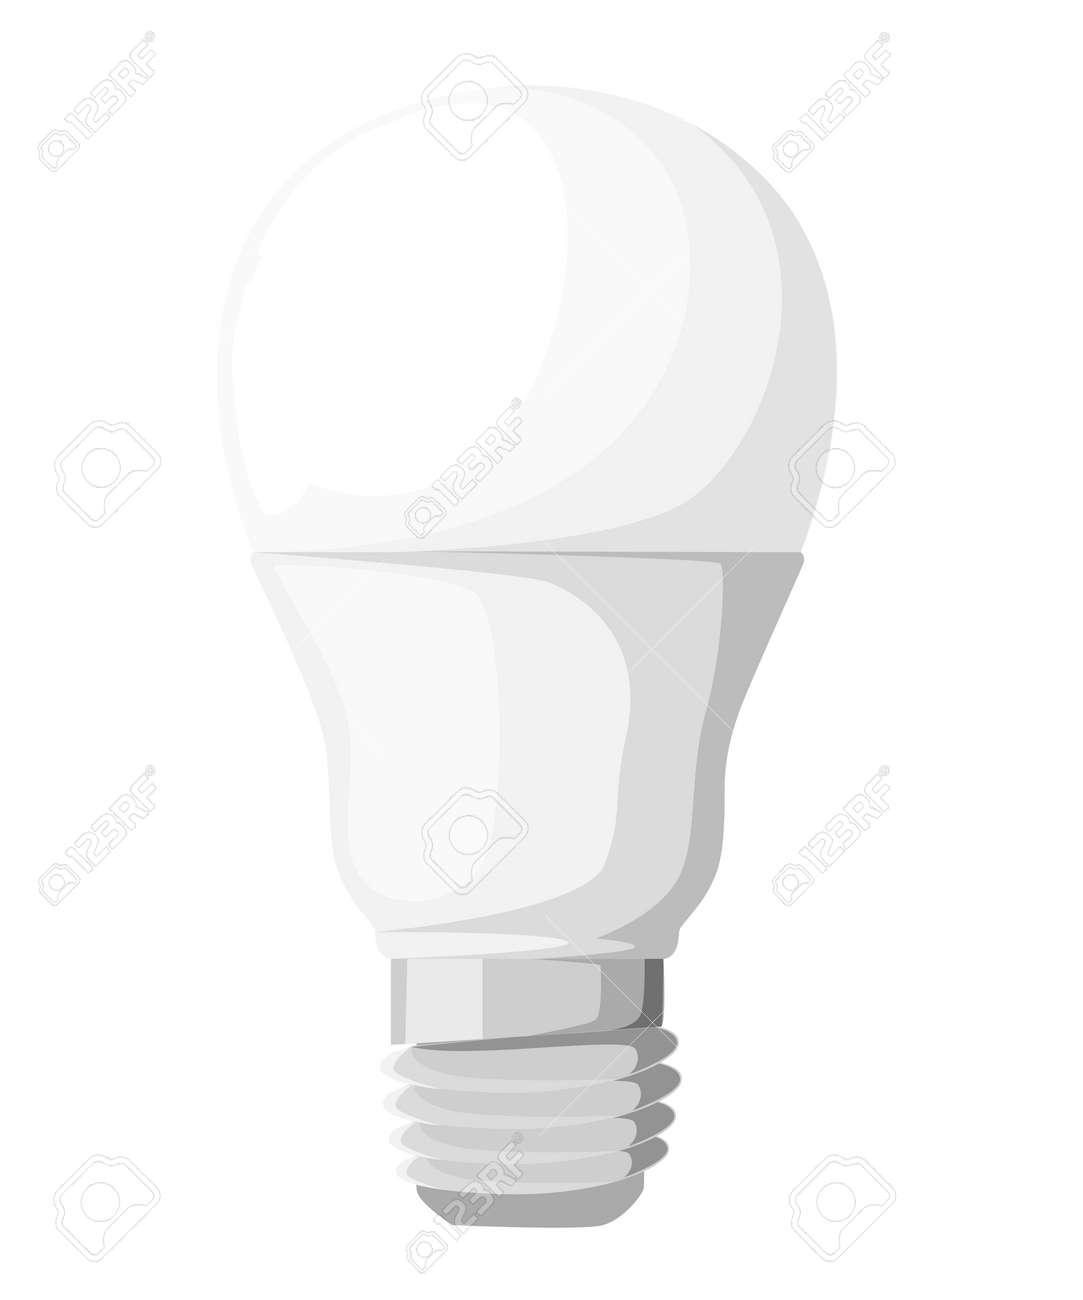 Tipos de iluminación eléctrica